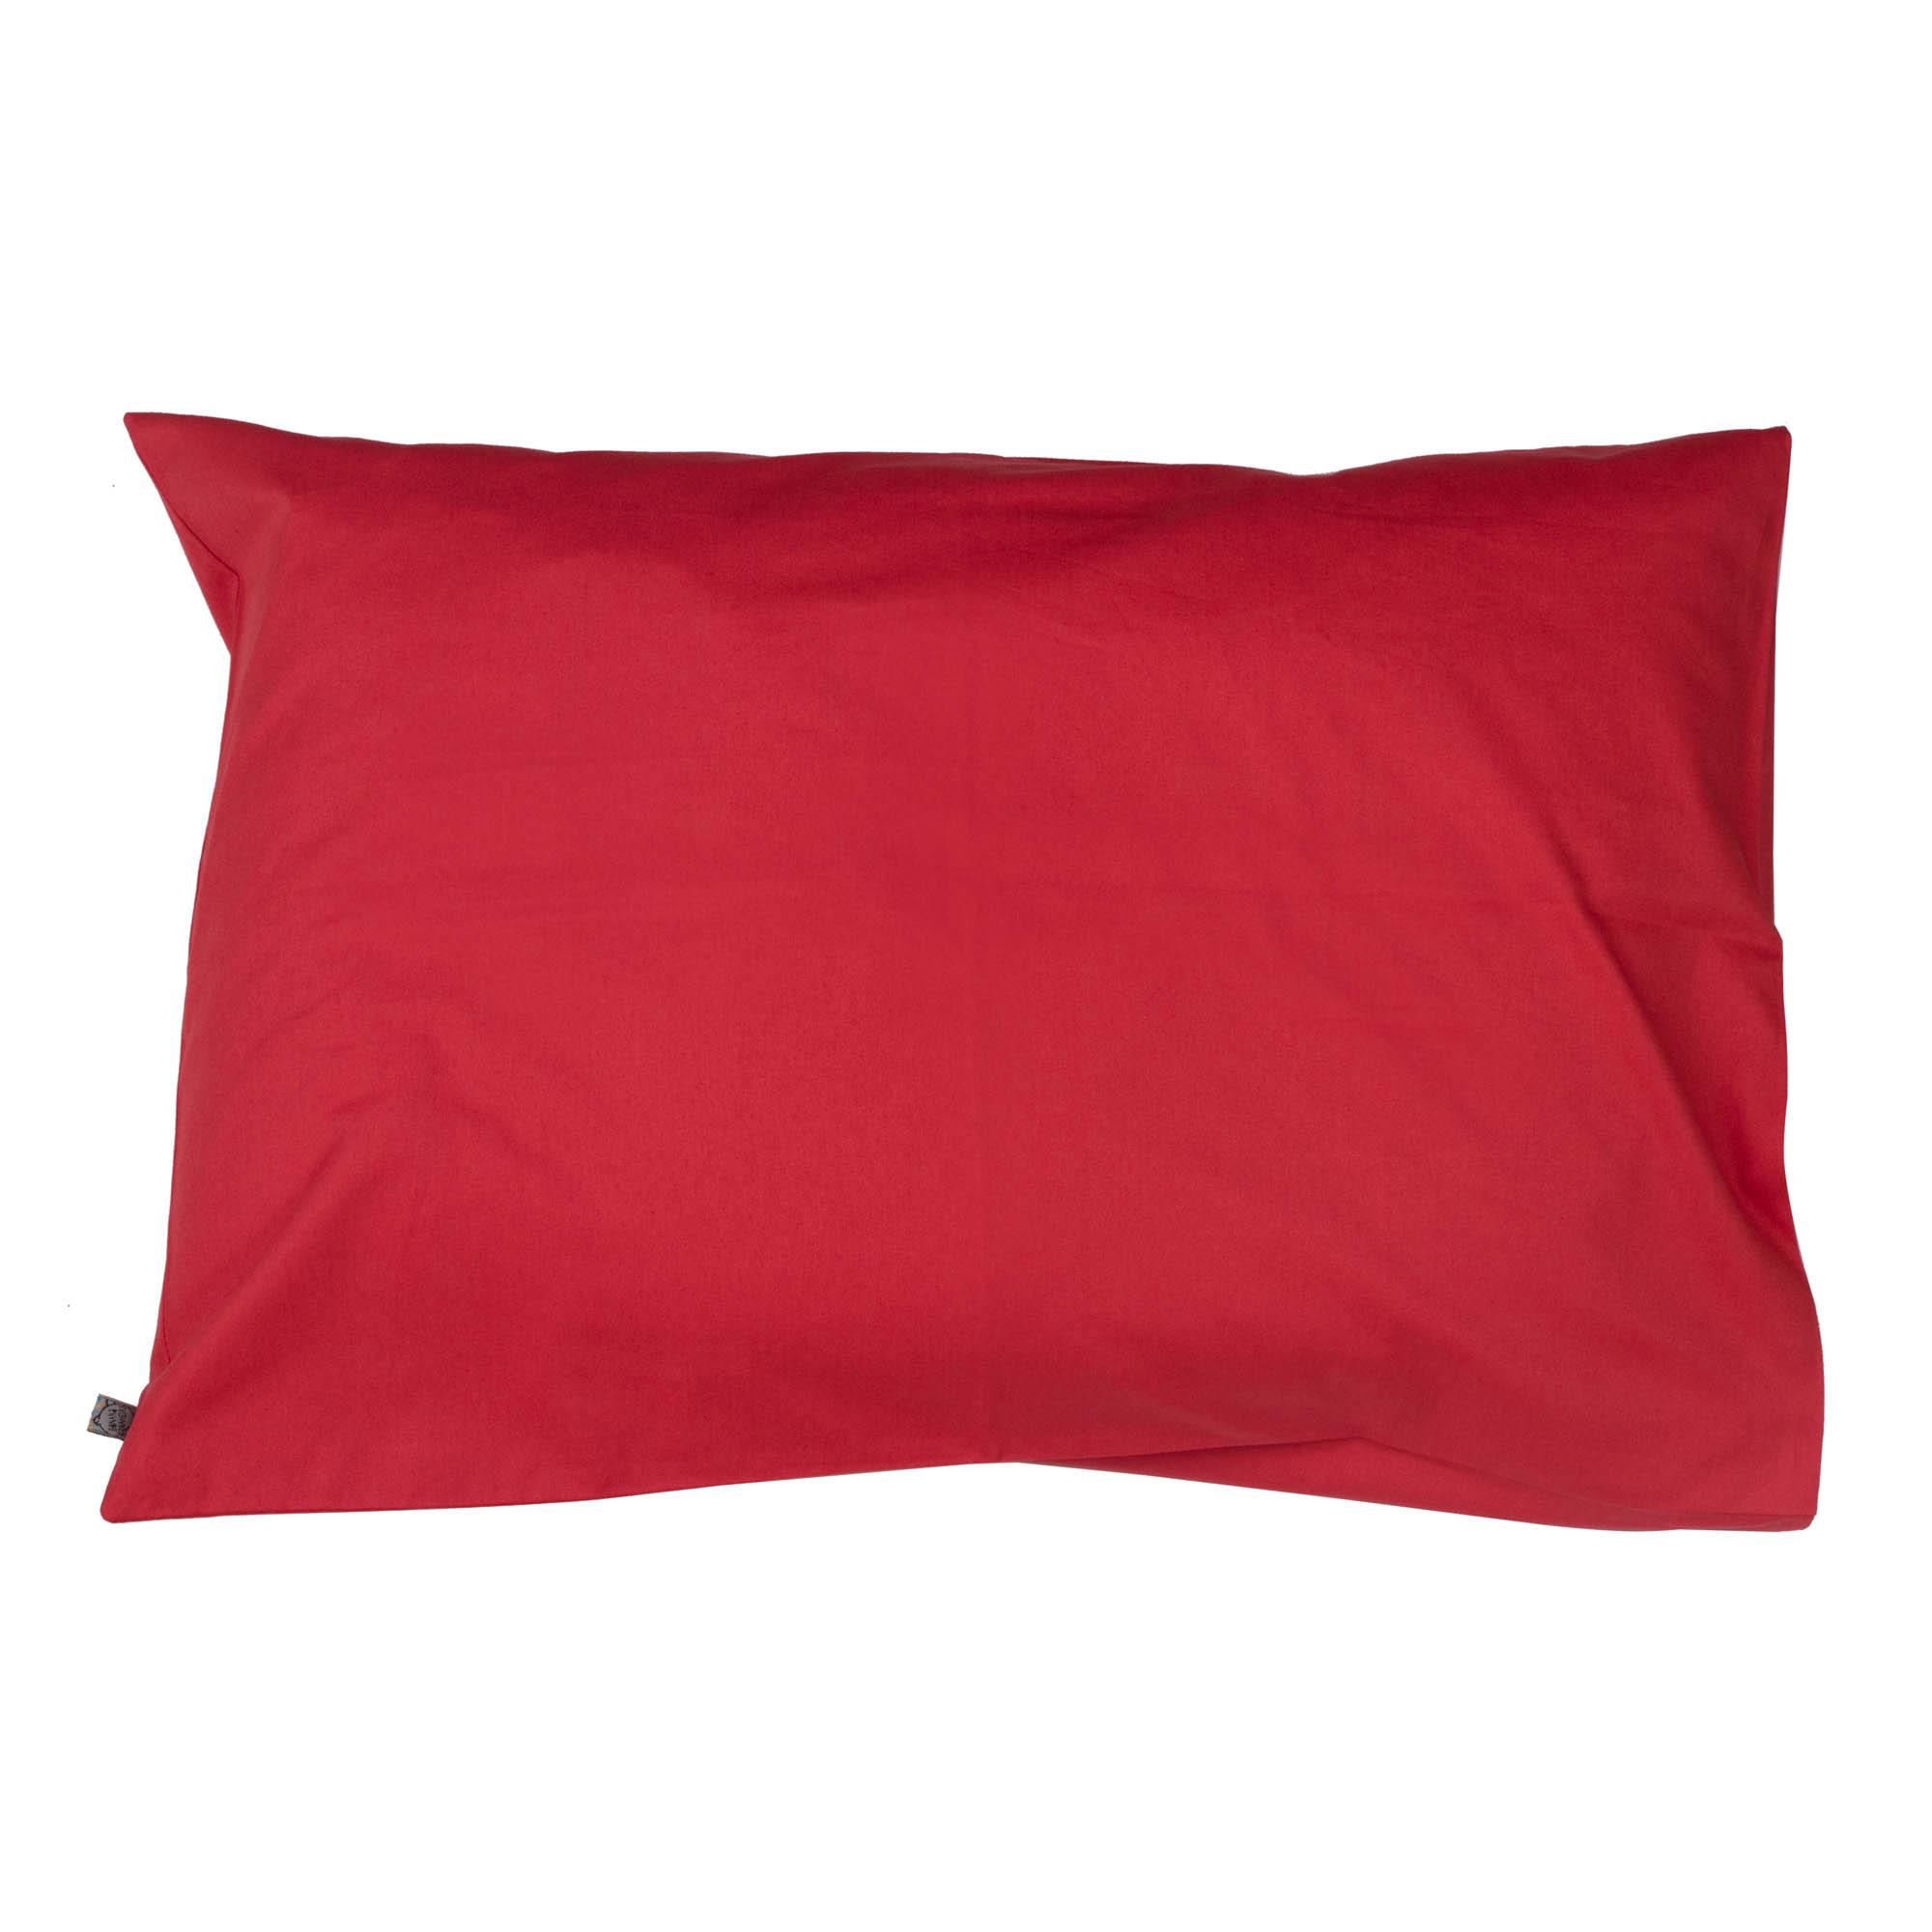 Porta travesseiro liso goiaba